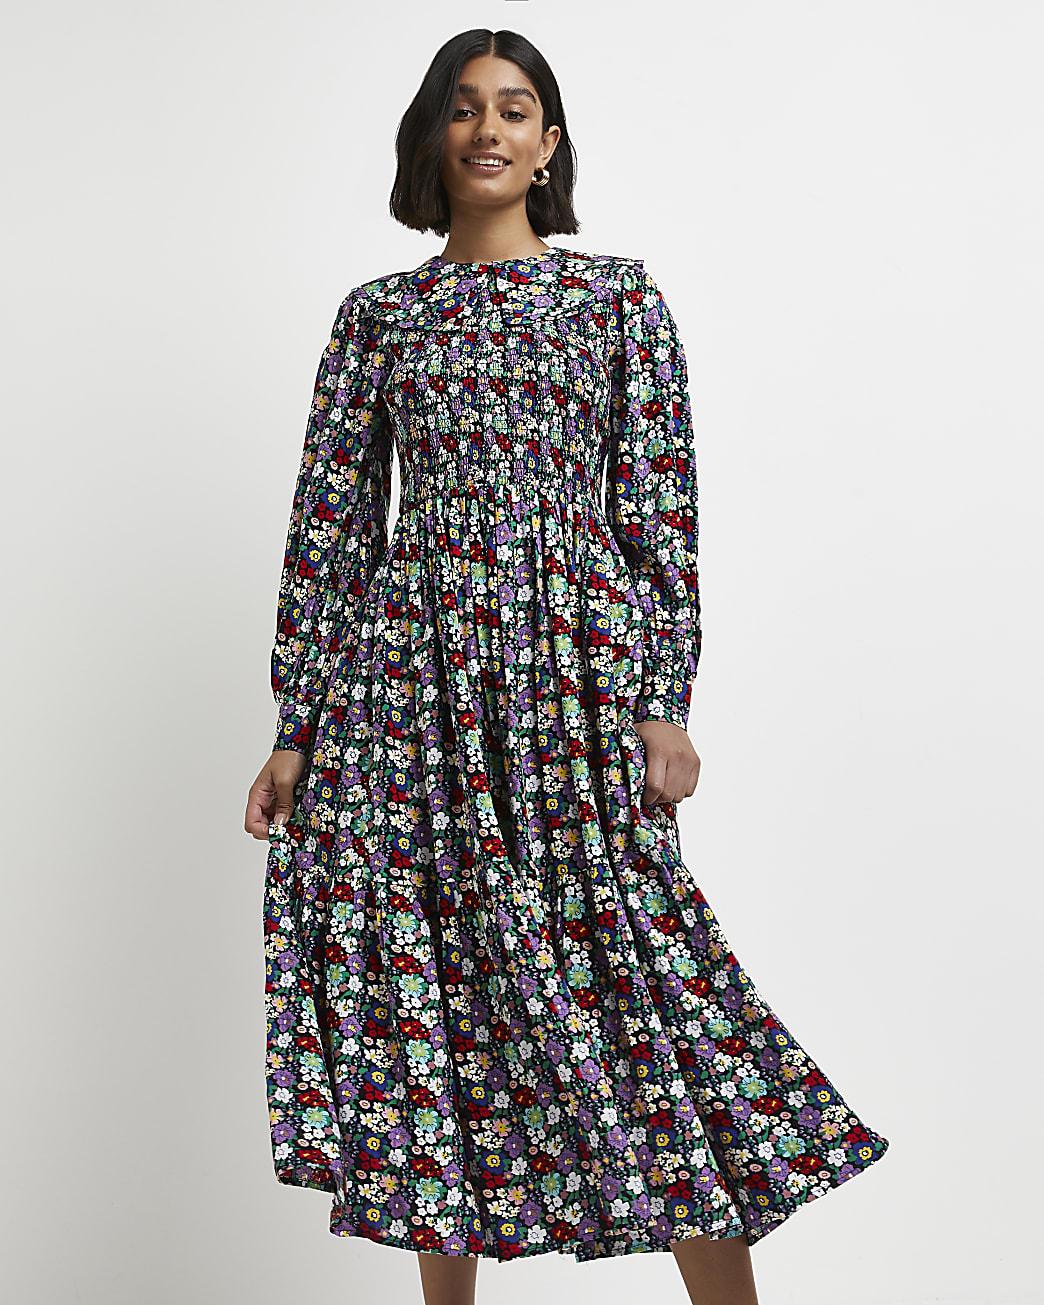 Black floral shirred midi dress